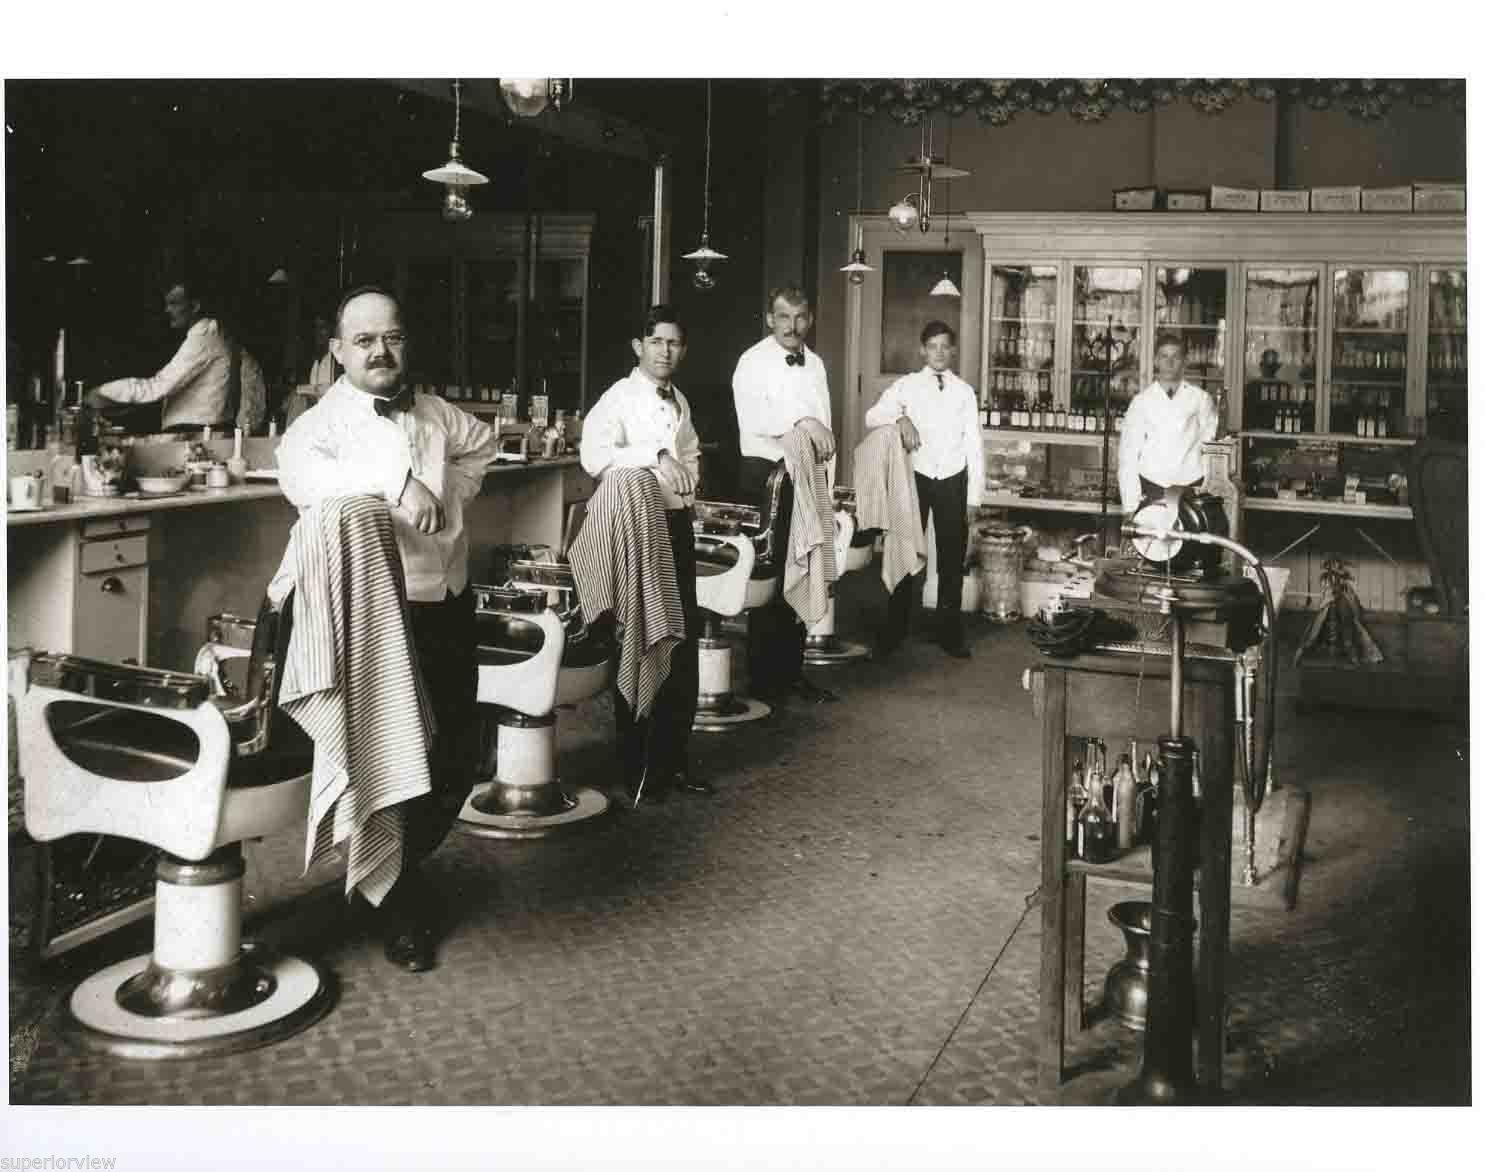 Vintage Barber Shop Old Time Barber Chairs Tonic Bottles Shoe Shine Barbers Look Old Fashion Barber Shop Barber Shop Barber Pictures